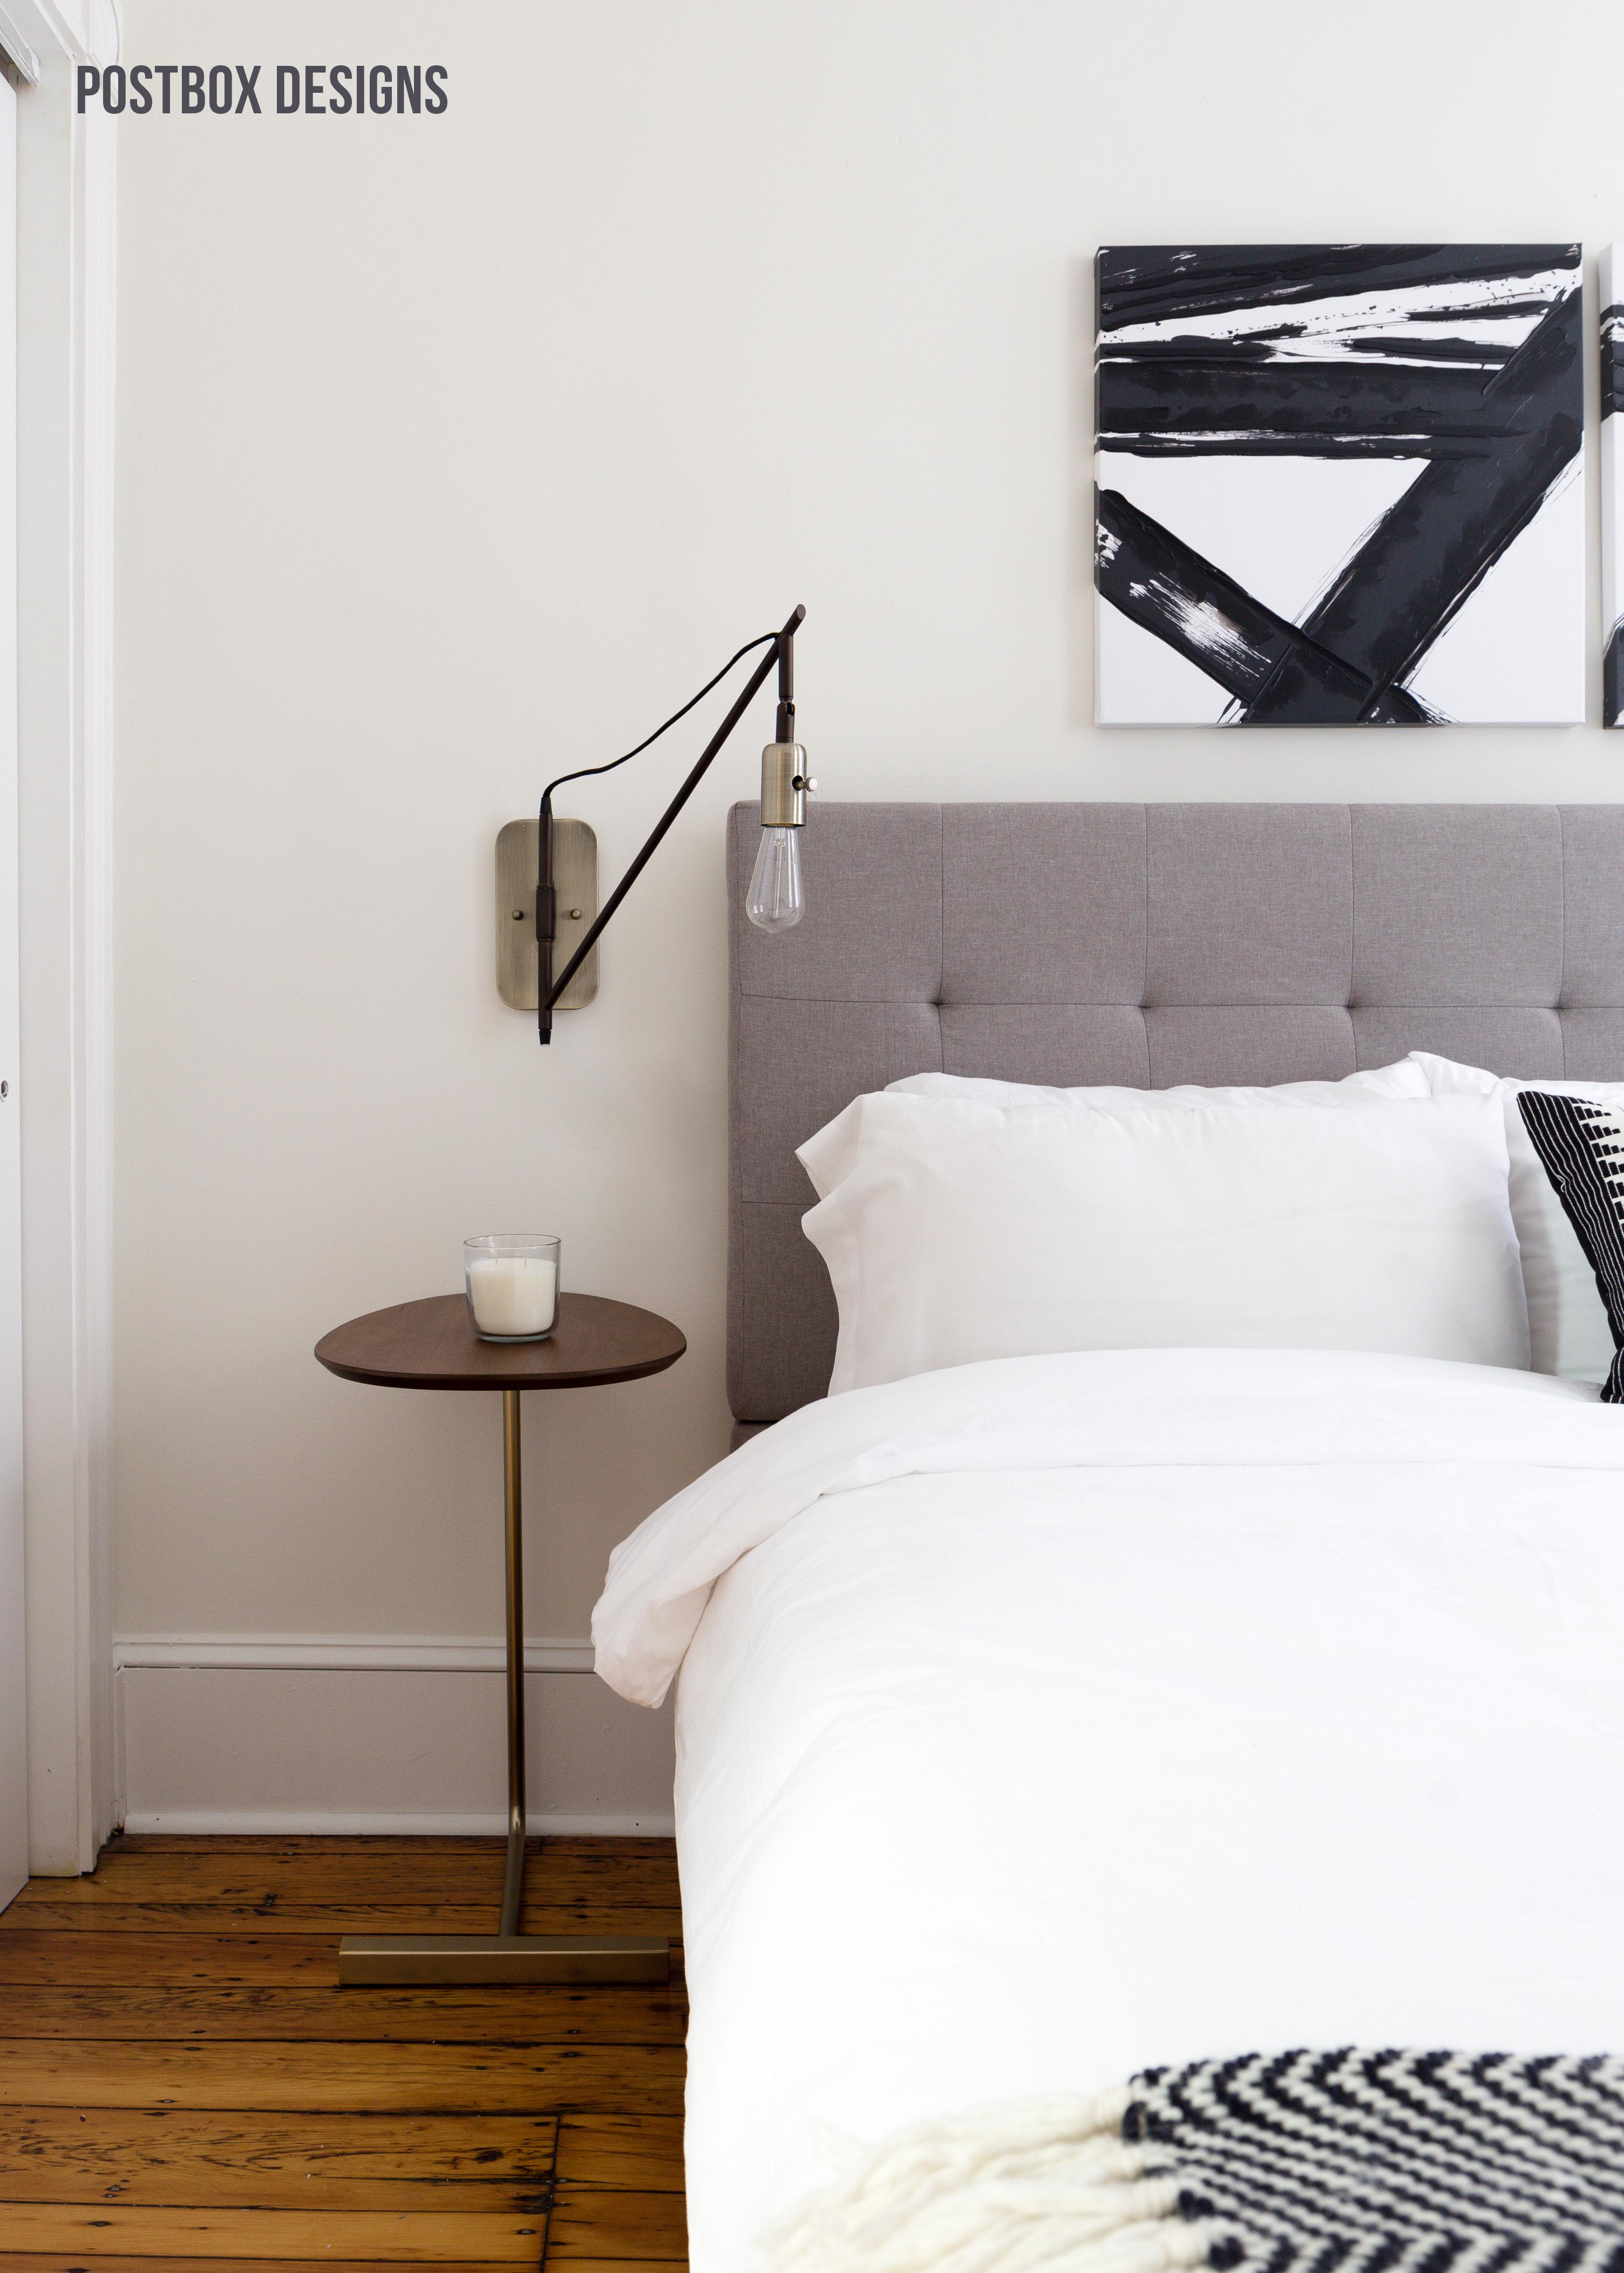 Neutral Modern Boho Bedroom Makeover Reveal: See the ... on Modern Boho Bedroom  id=16870